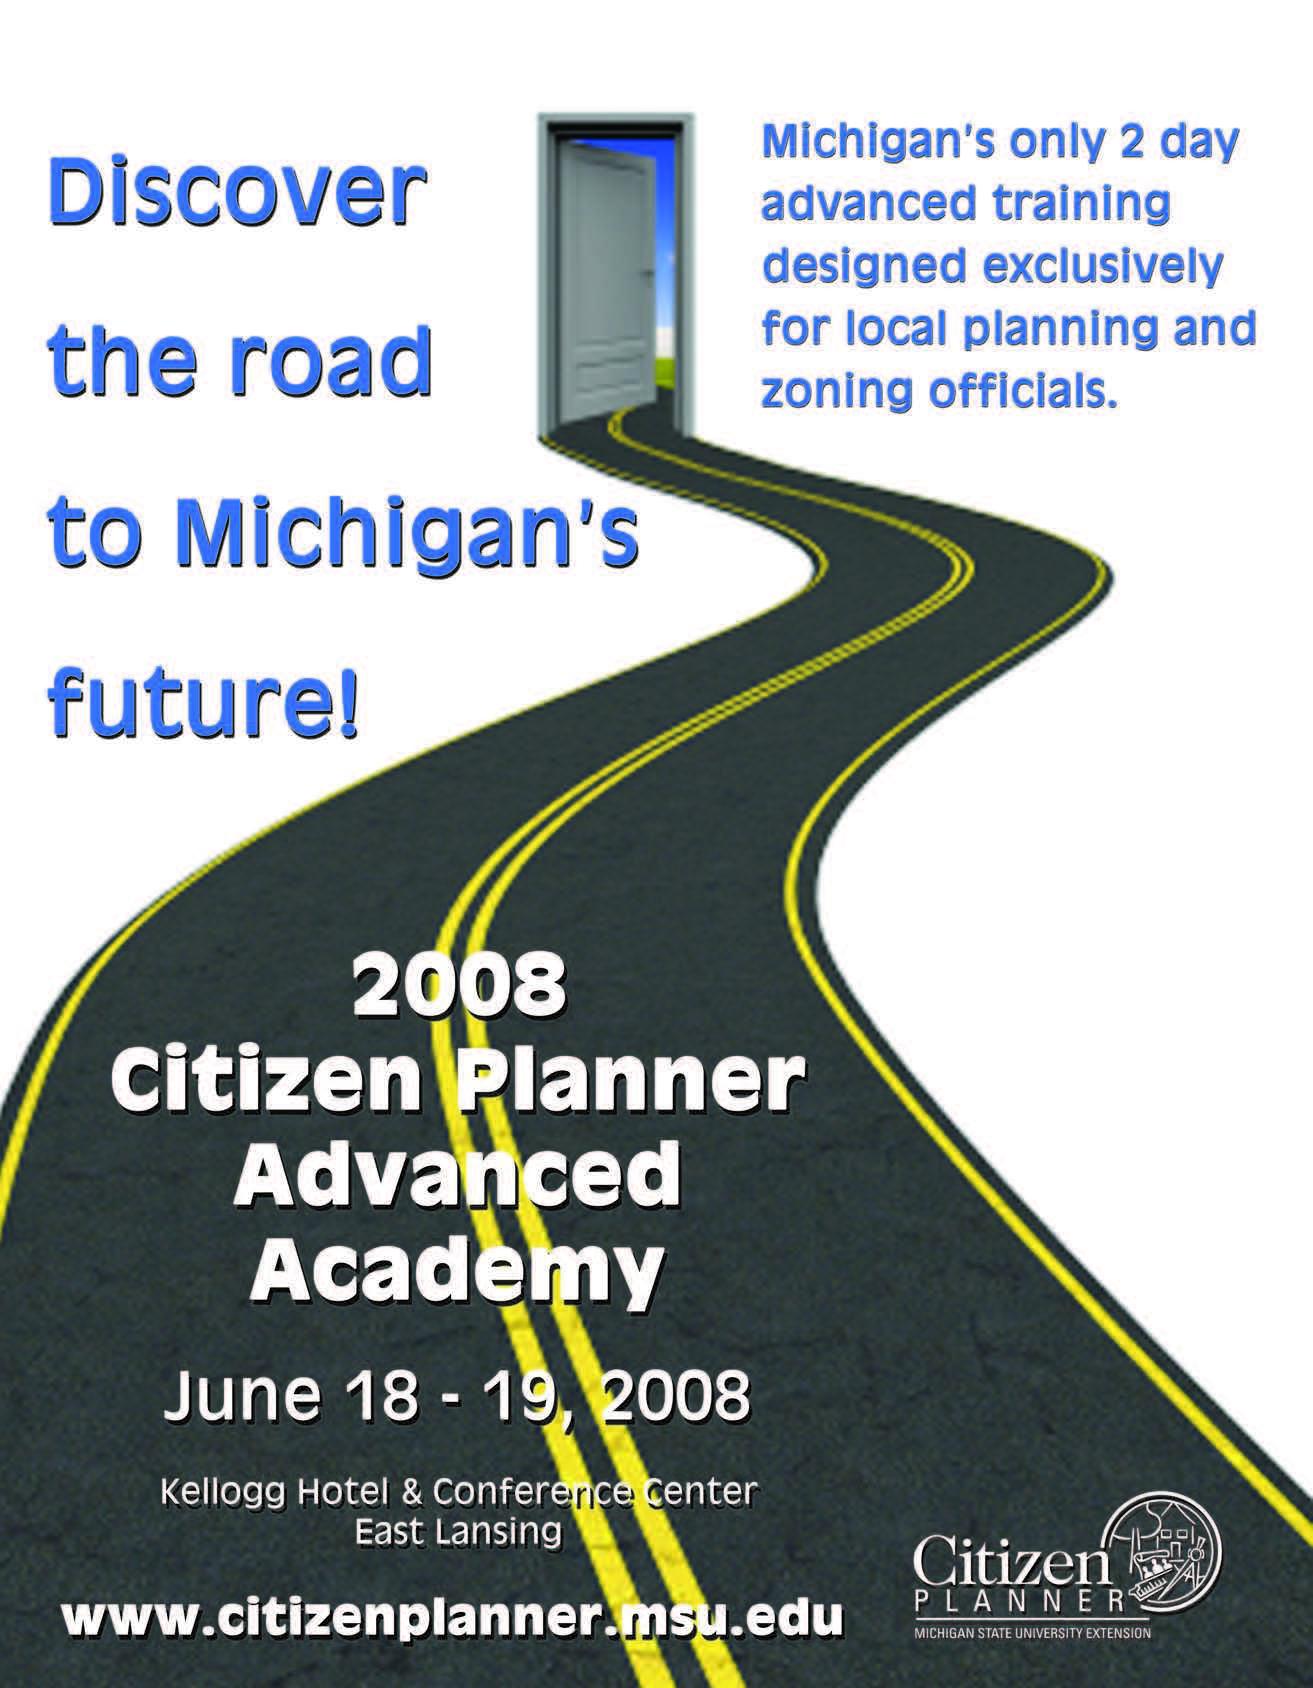 Citizen Planner MTN Ad 04/08 Issue